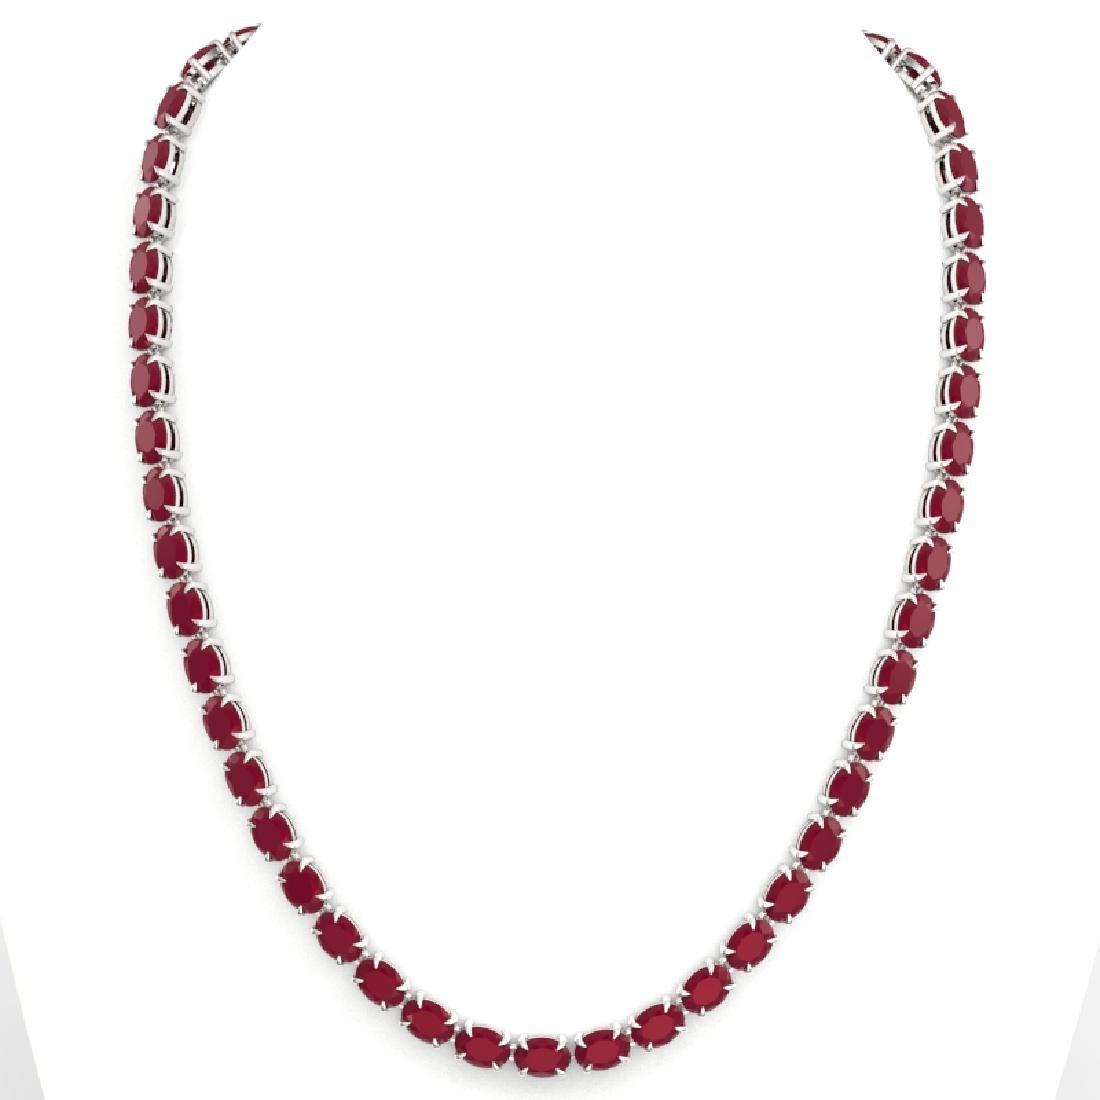 68 CTW Ruby Eternity Designer Inspired Tennis Necklace - 3